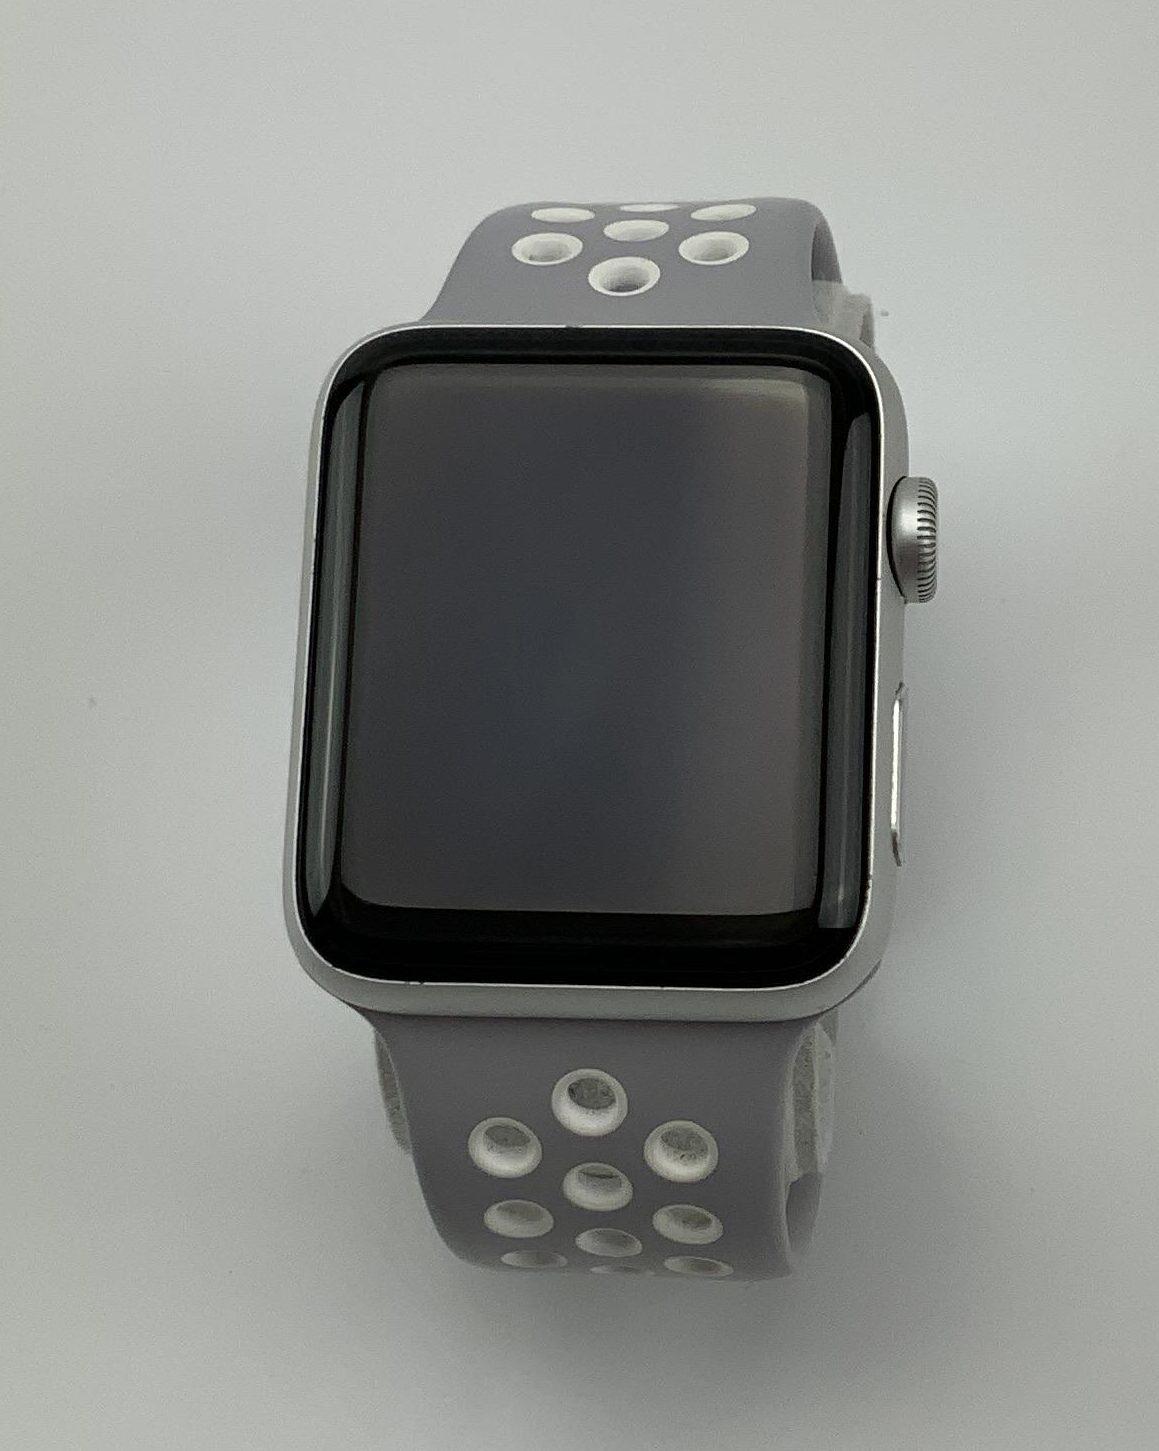 Watch Series 2 Aluminum (42mm), Silver, Grey Nike Sport Band, Bild 2